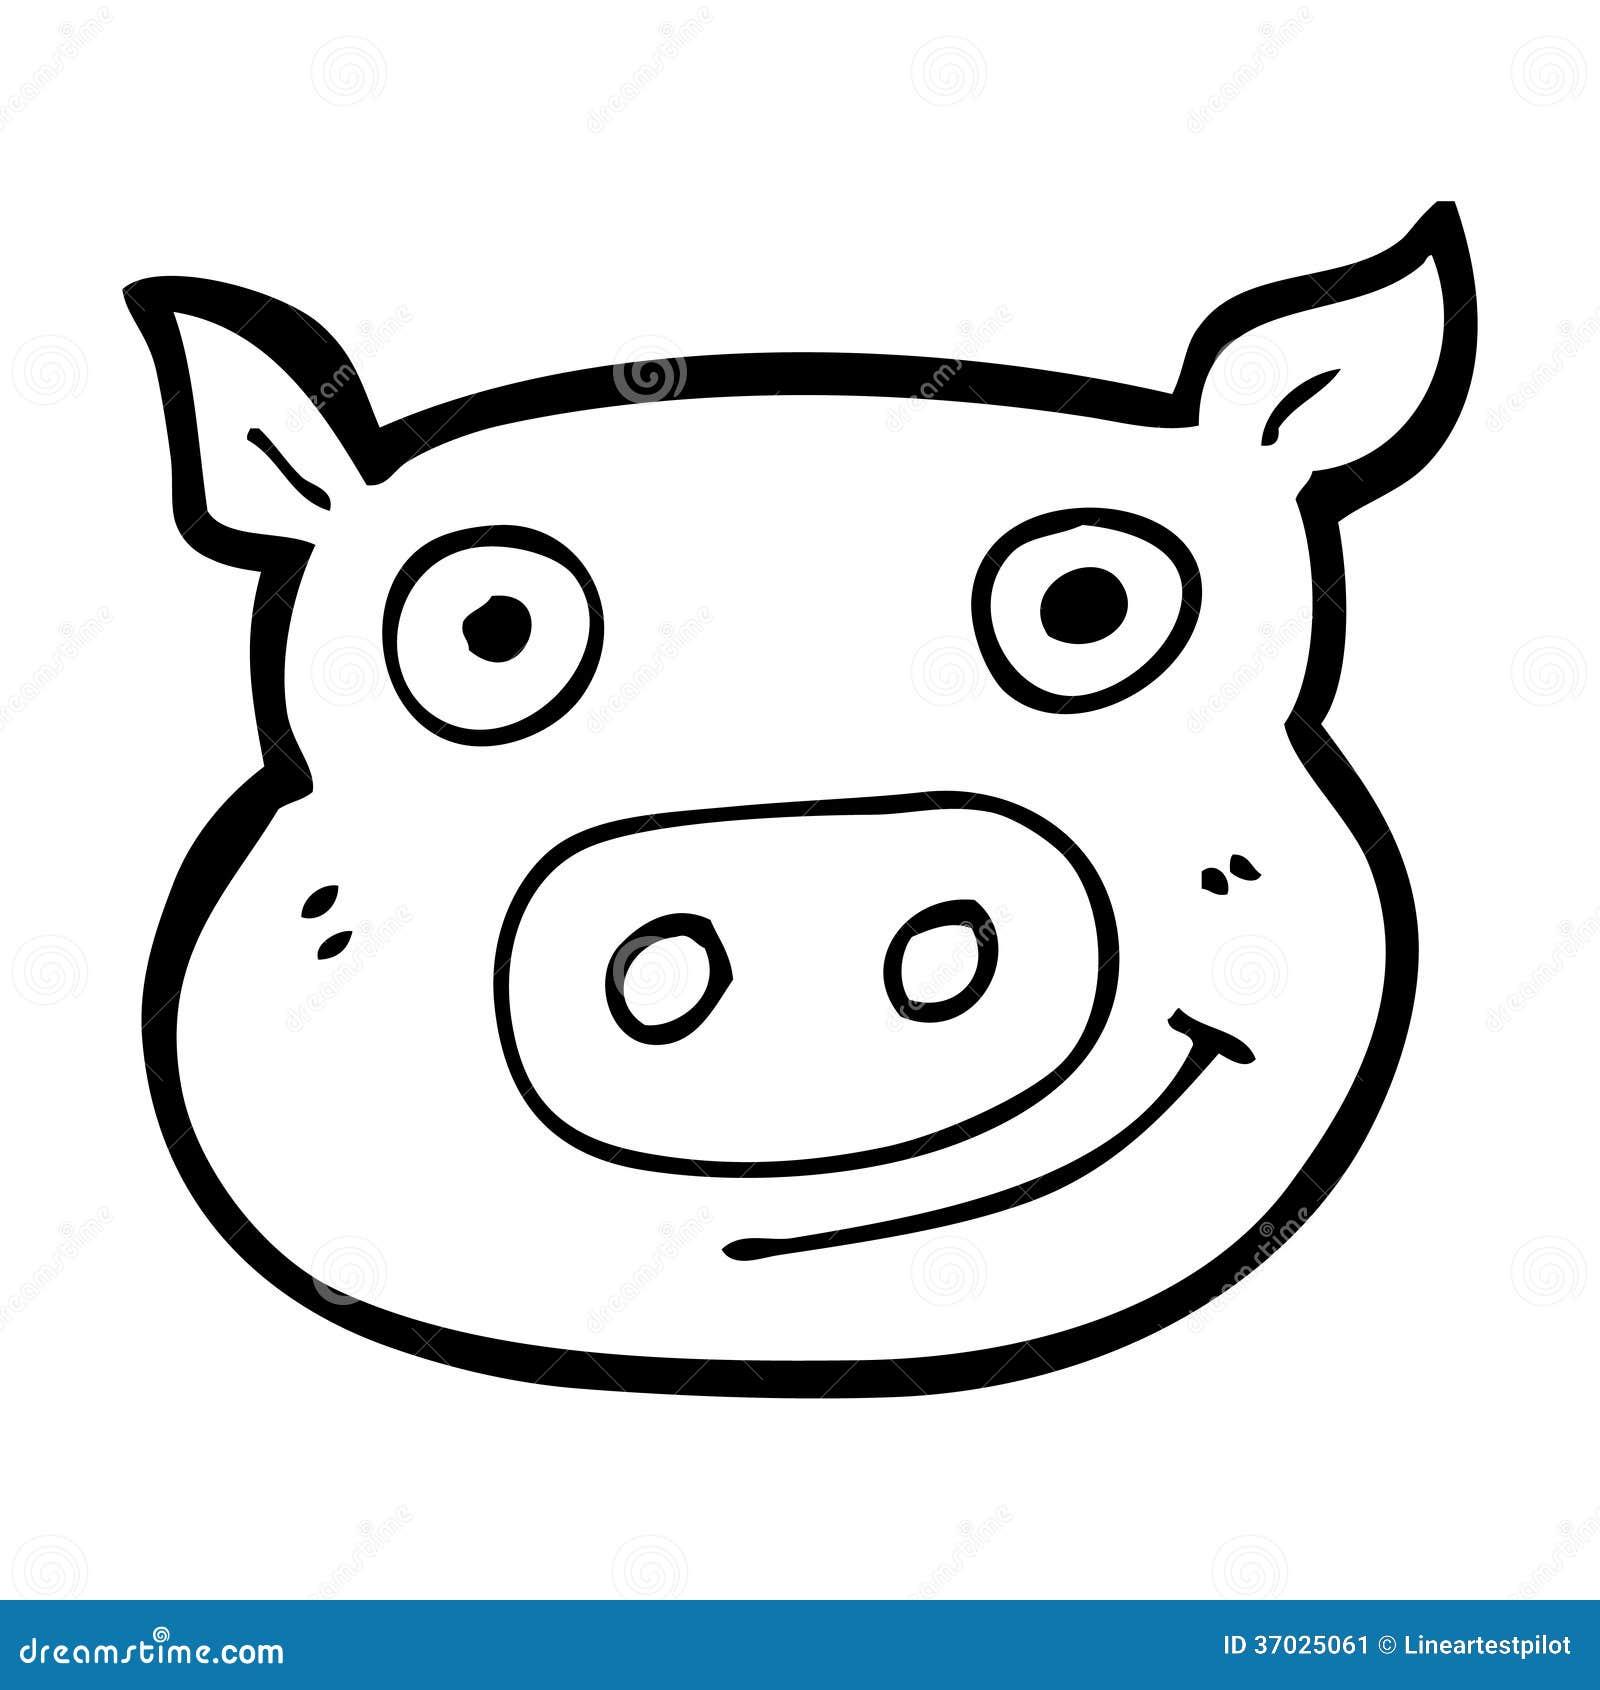 Line Drawing Pig Face : Cartoon pig face stock image